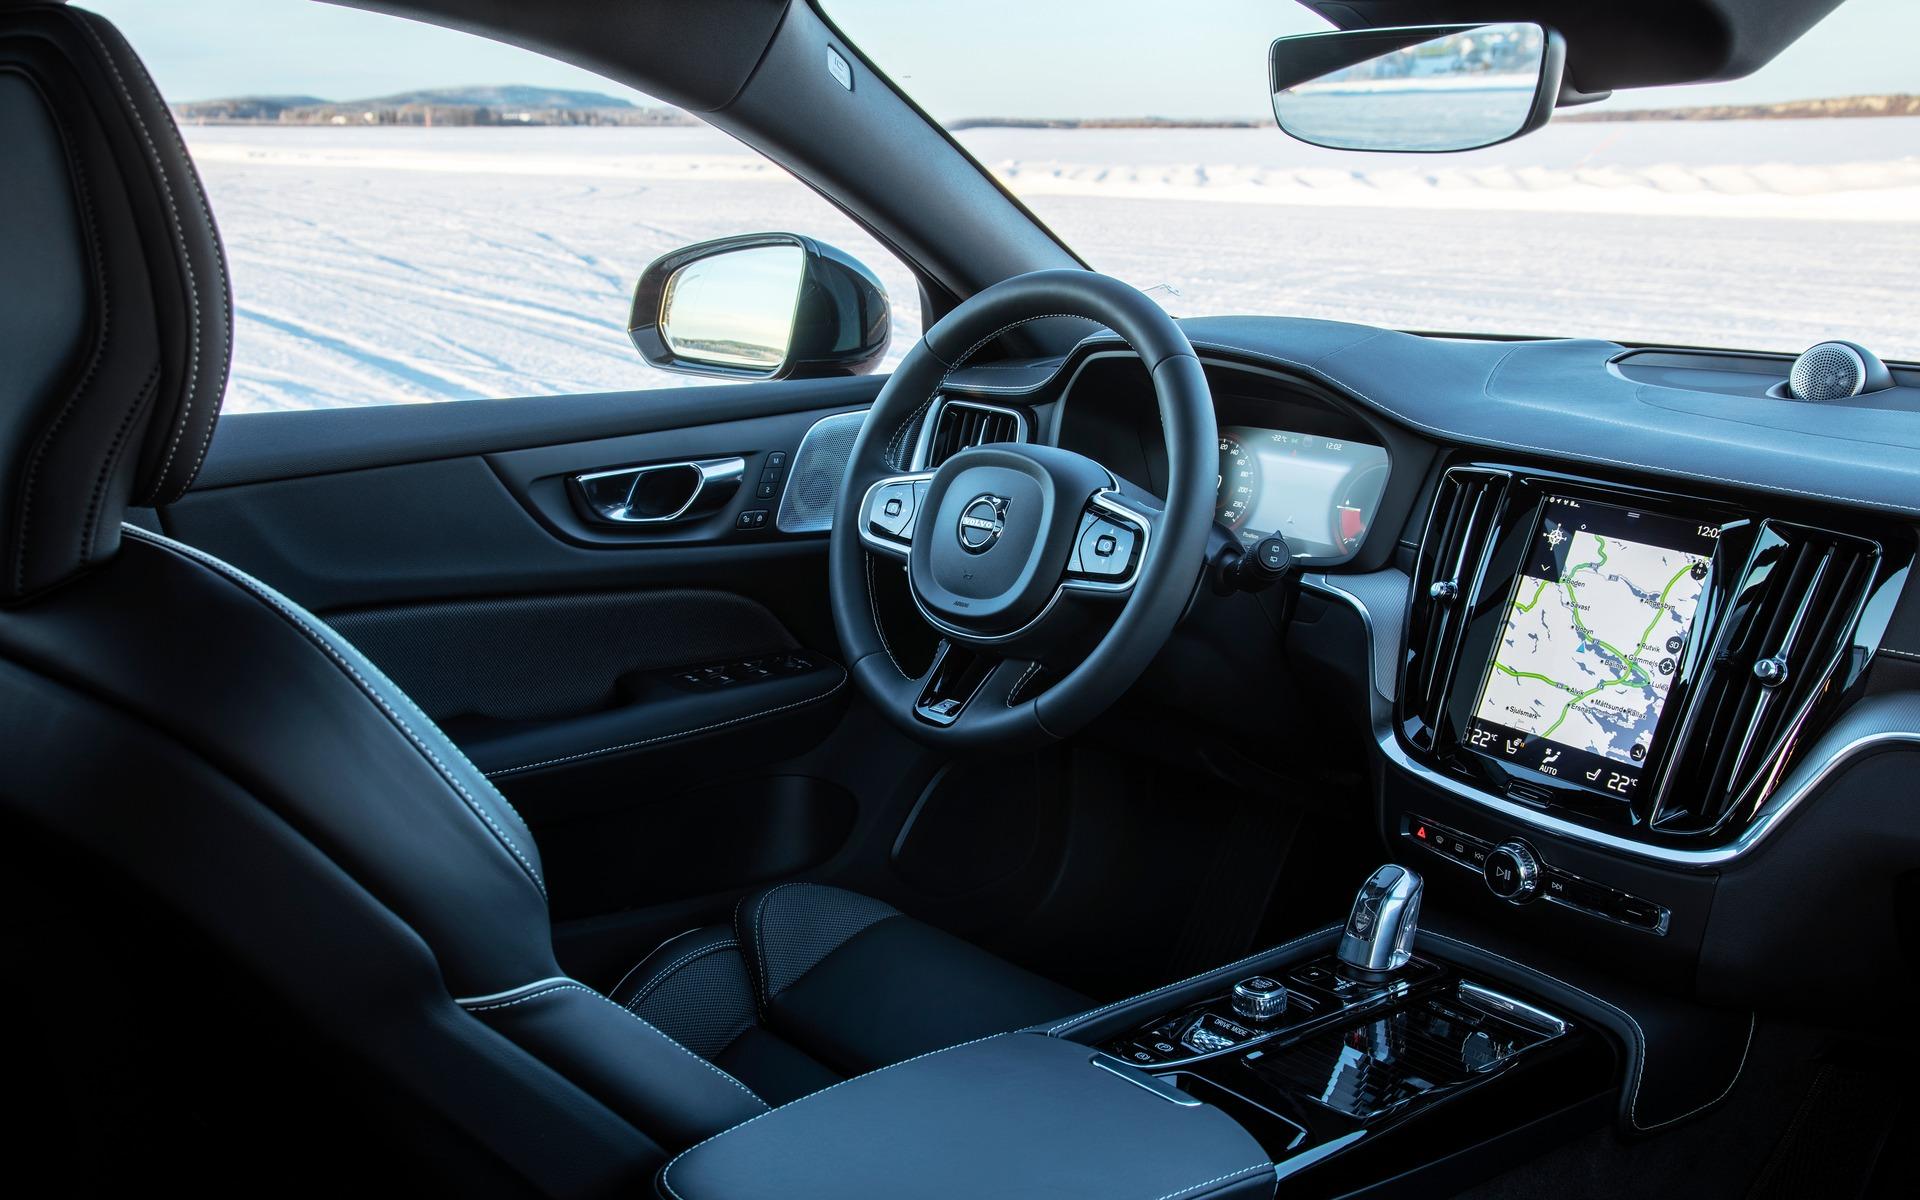 Volvo V60 2019 : on a conduit la seule voiture familiale hybride rechargeable 366019_2019_Volvo_V60